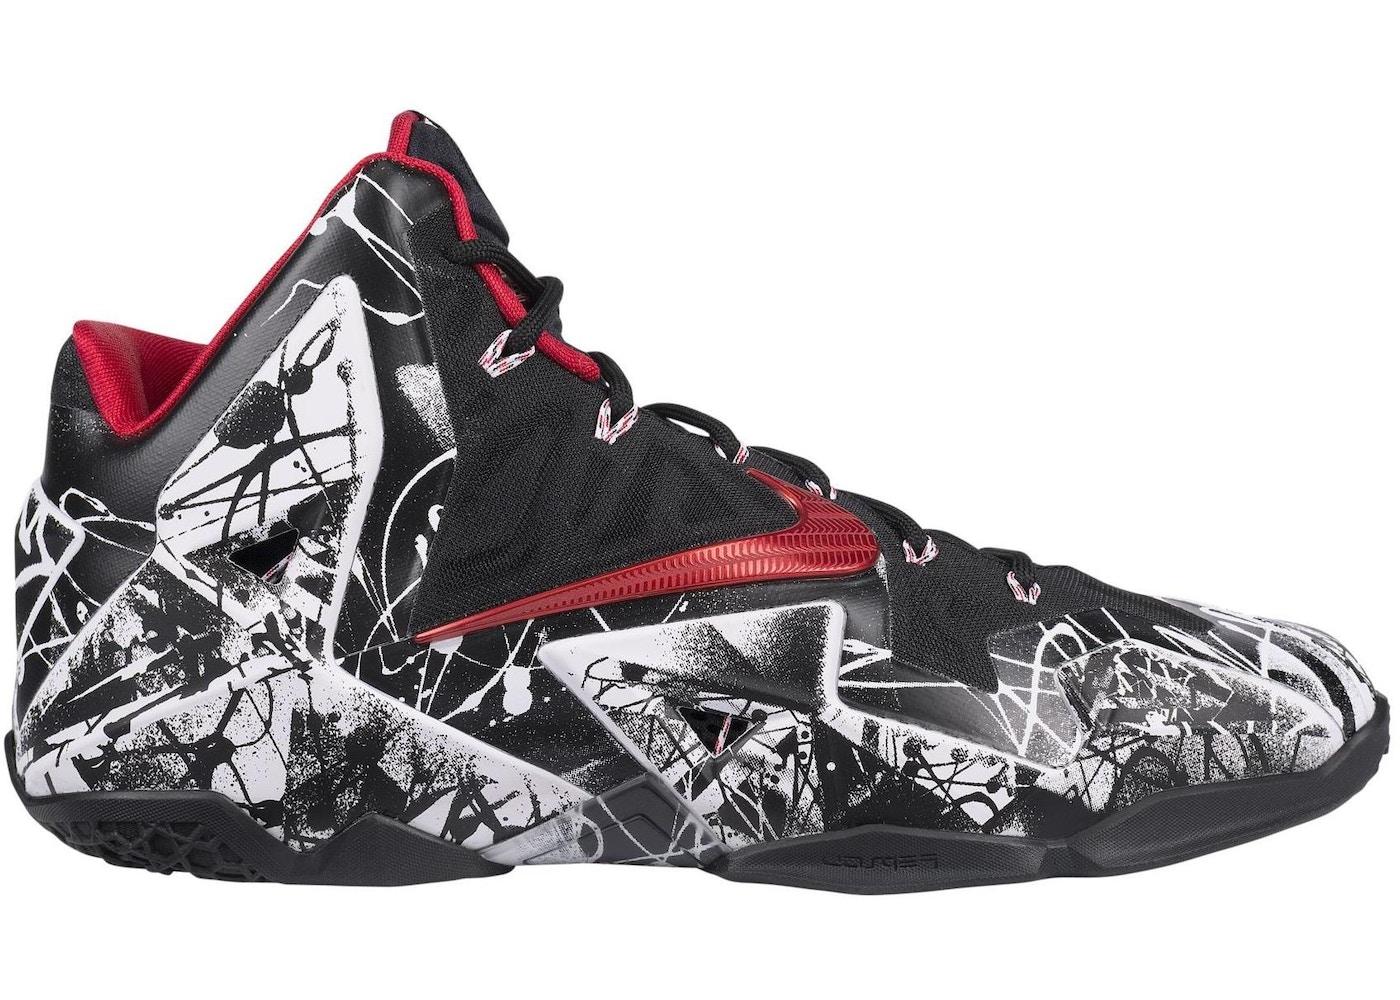 7708abffb503 Buy Nike LeBron 11 Shoes   Deadstock Sneakers